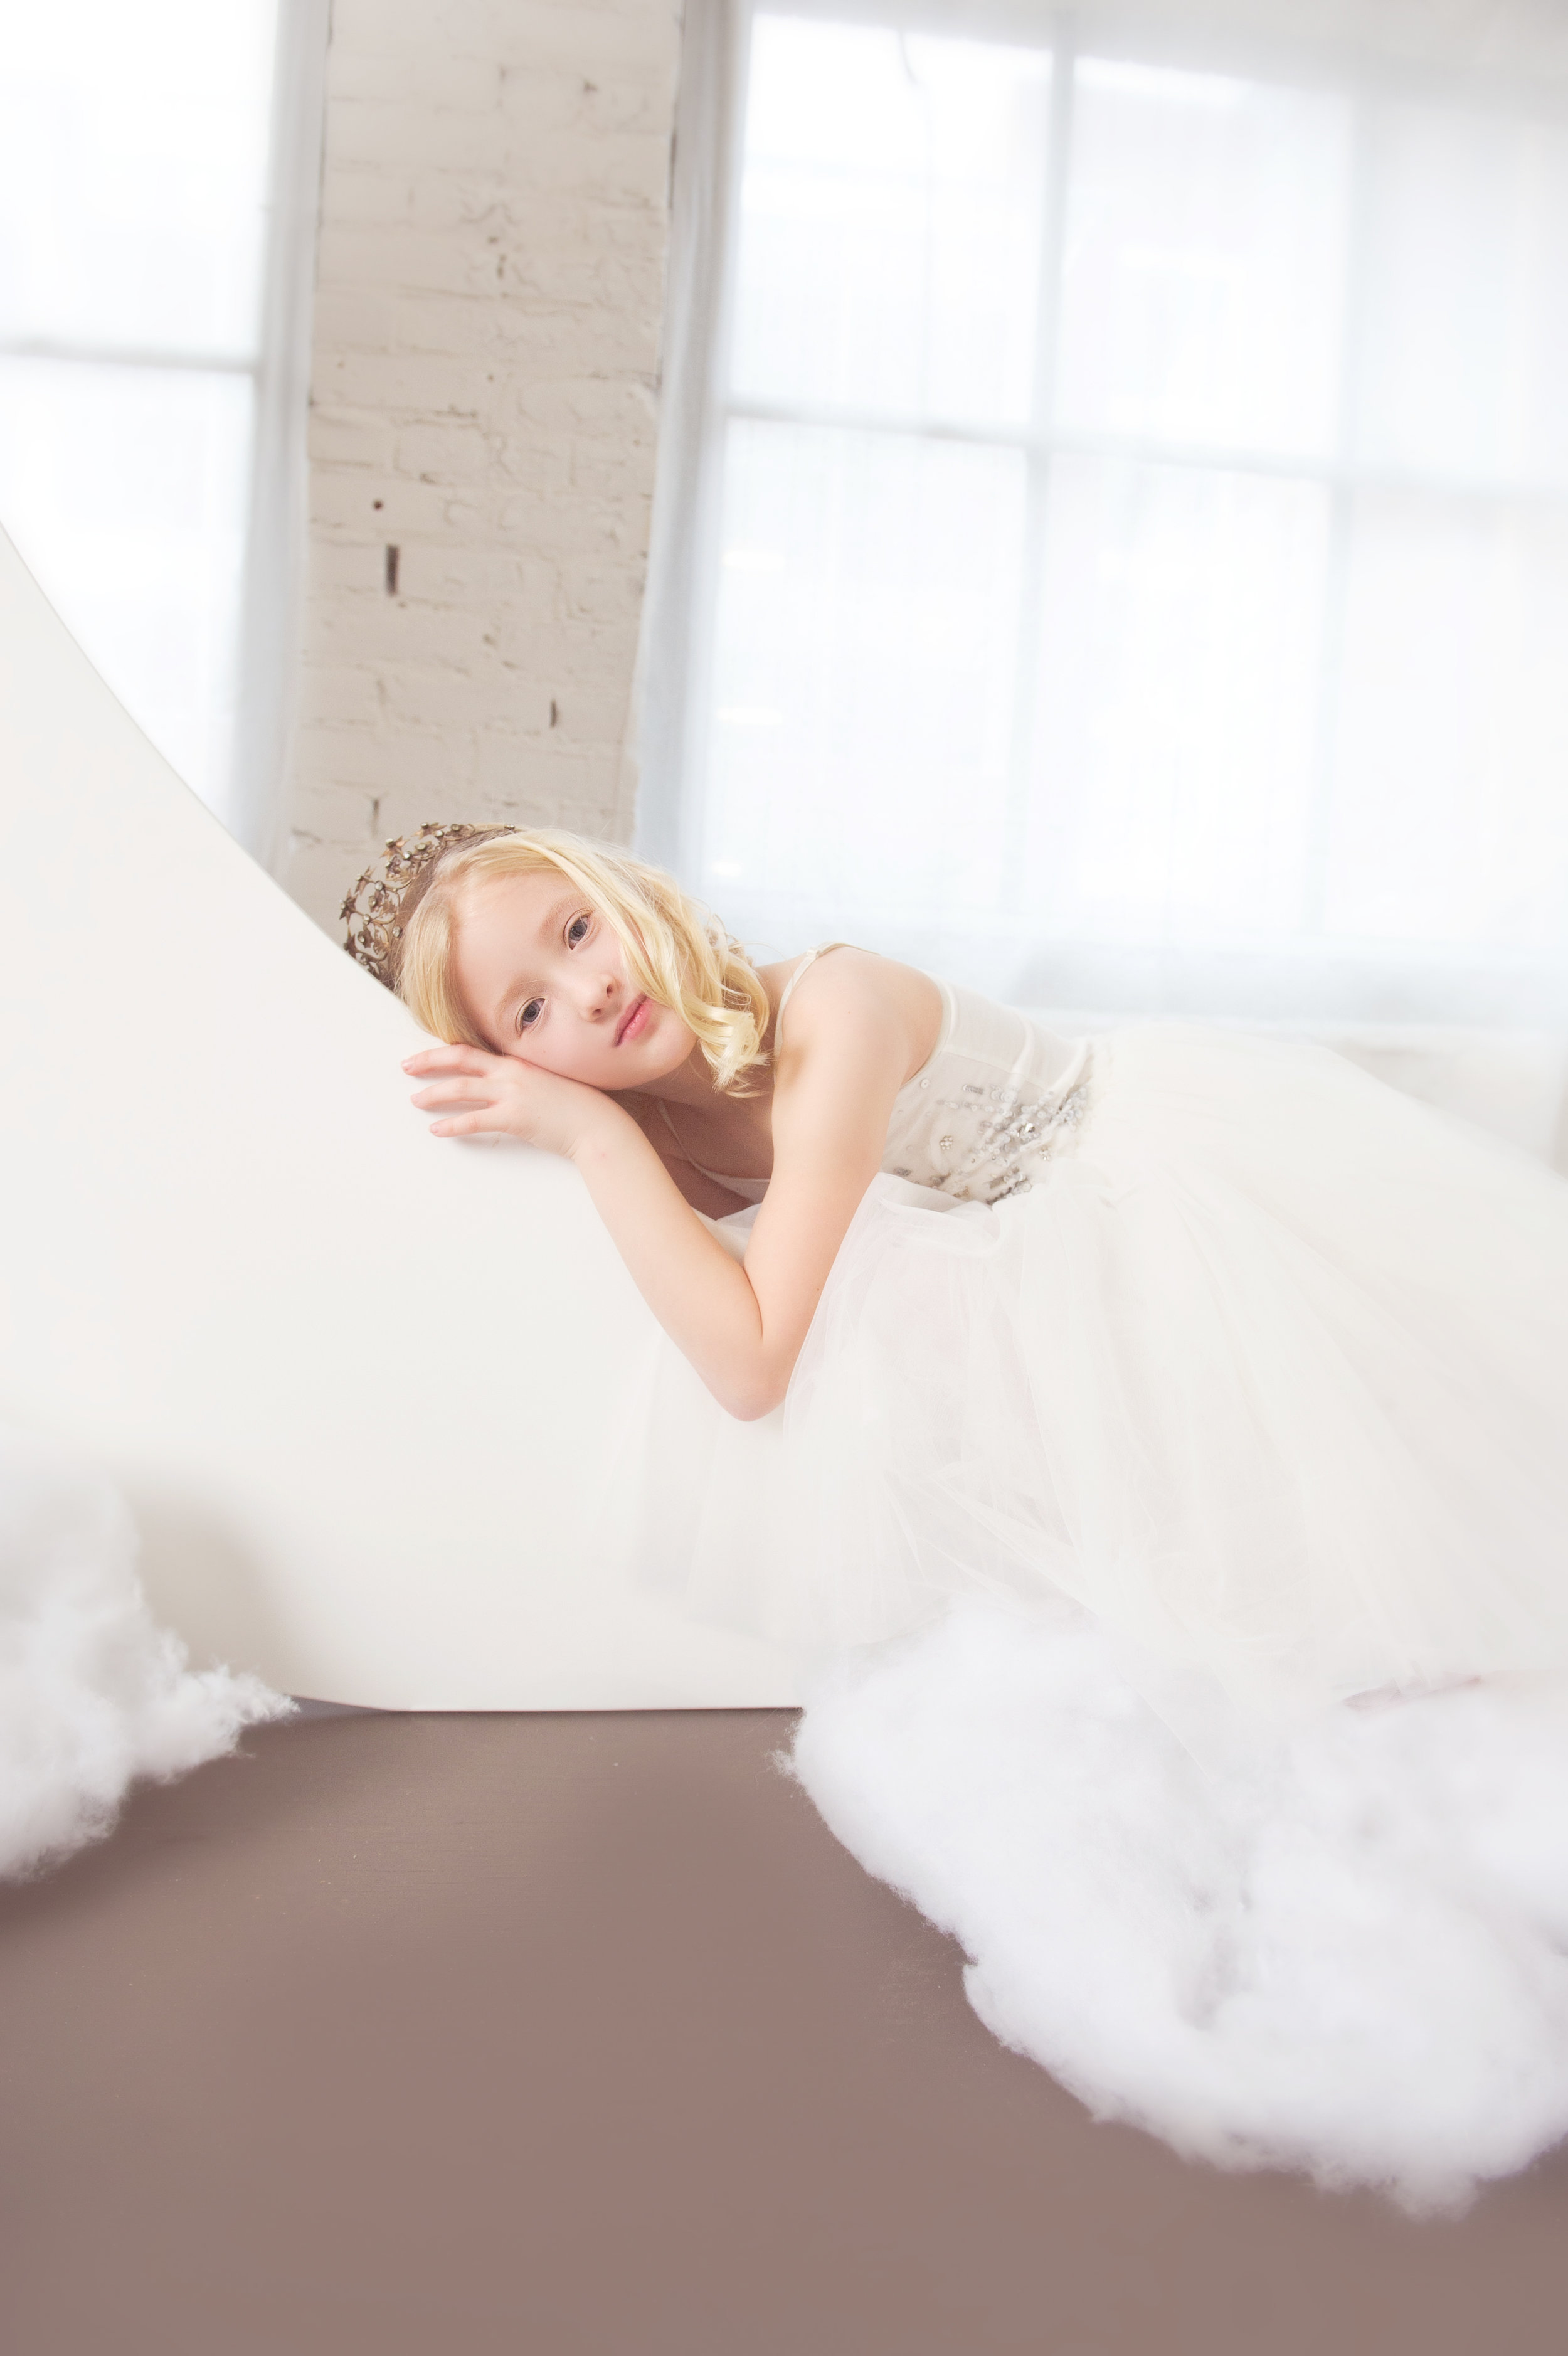 Bozeman-Photographer-Wedding-Family-Tina-Stinson-1.jpg